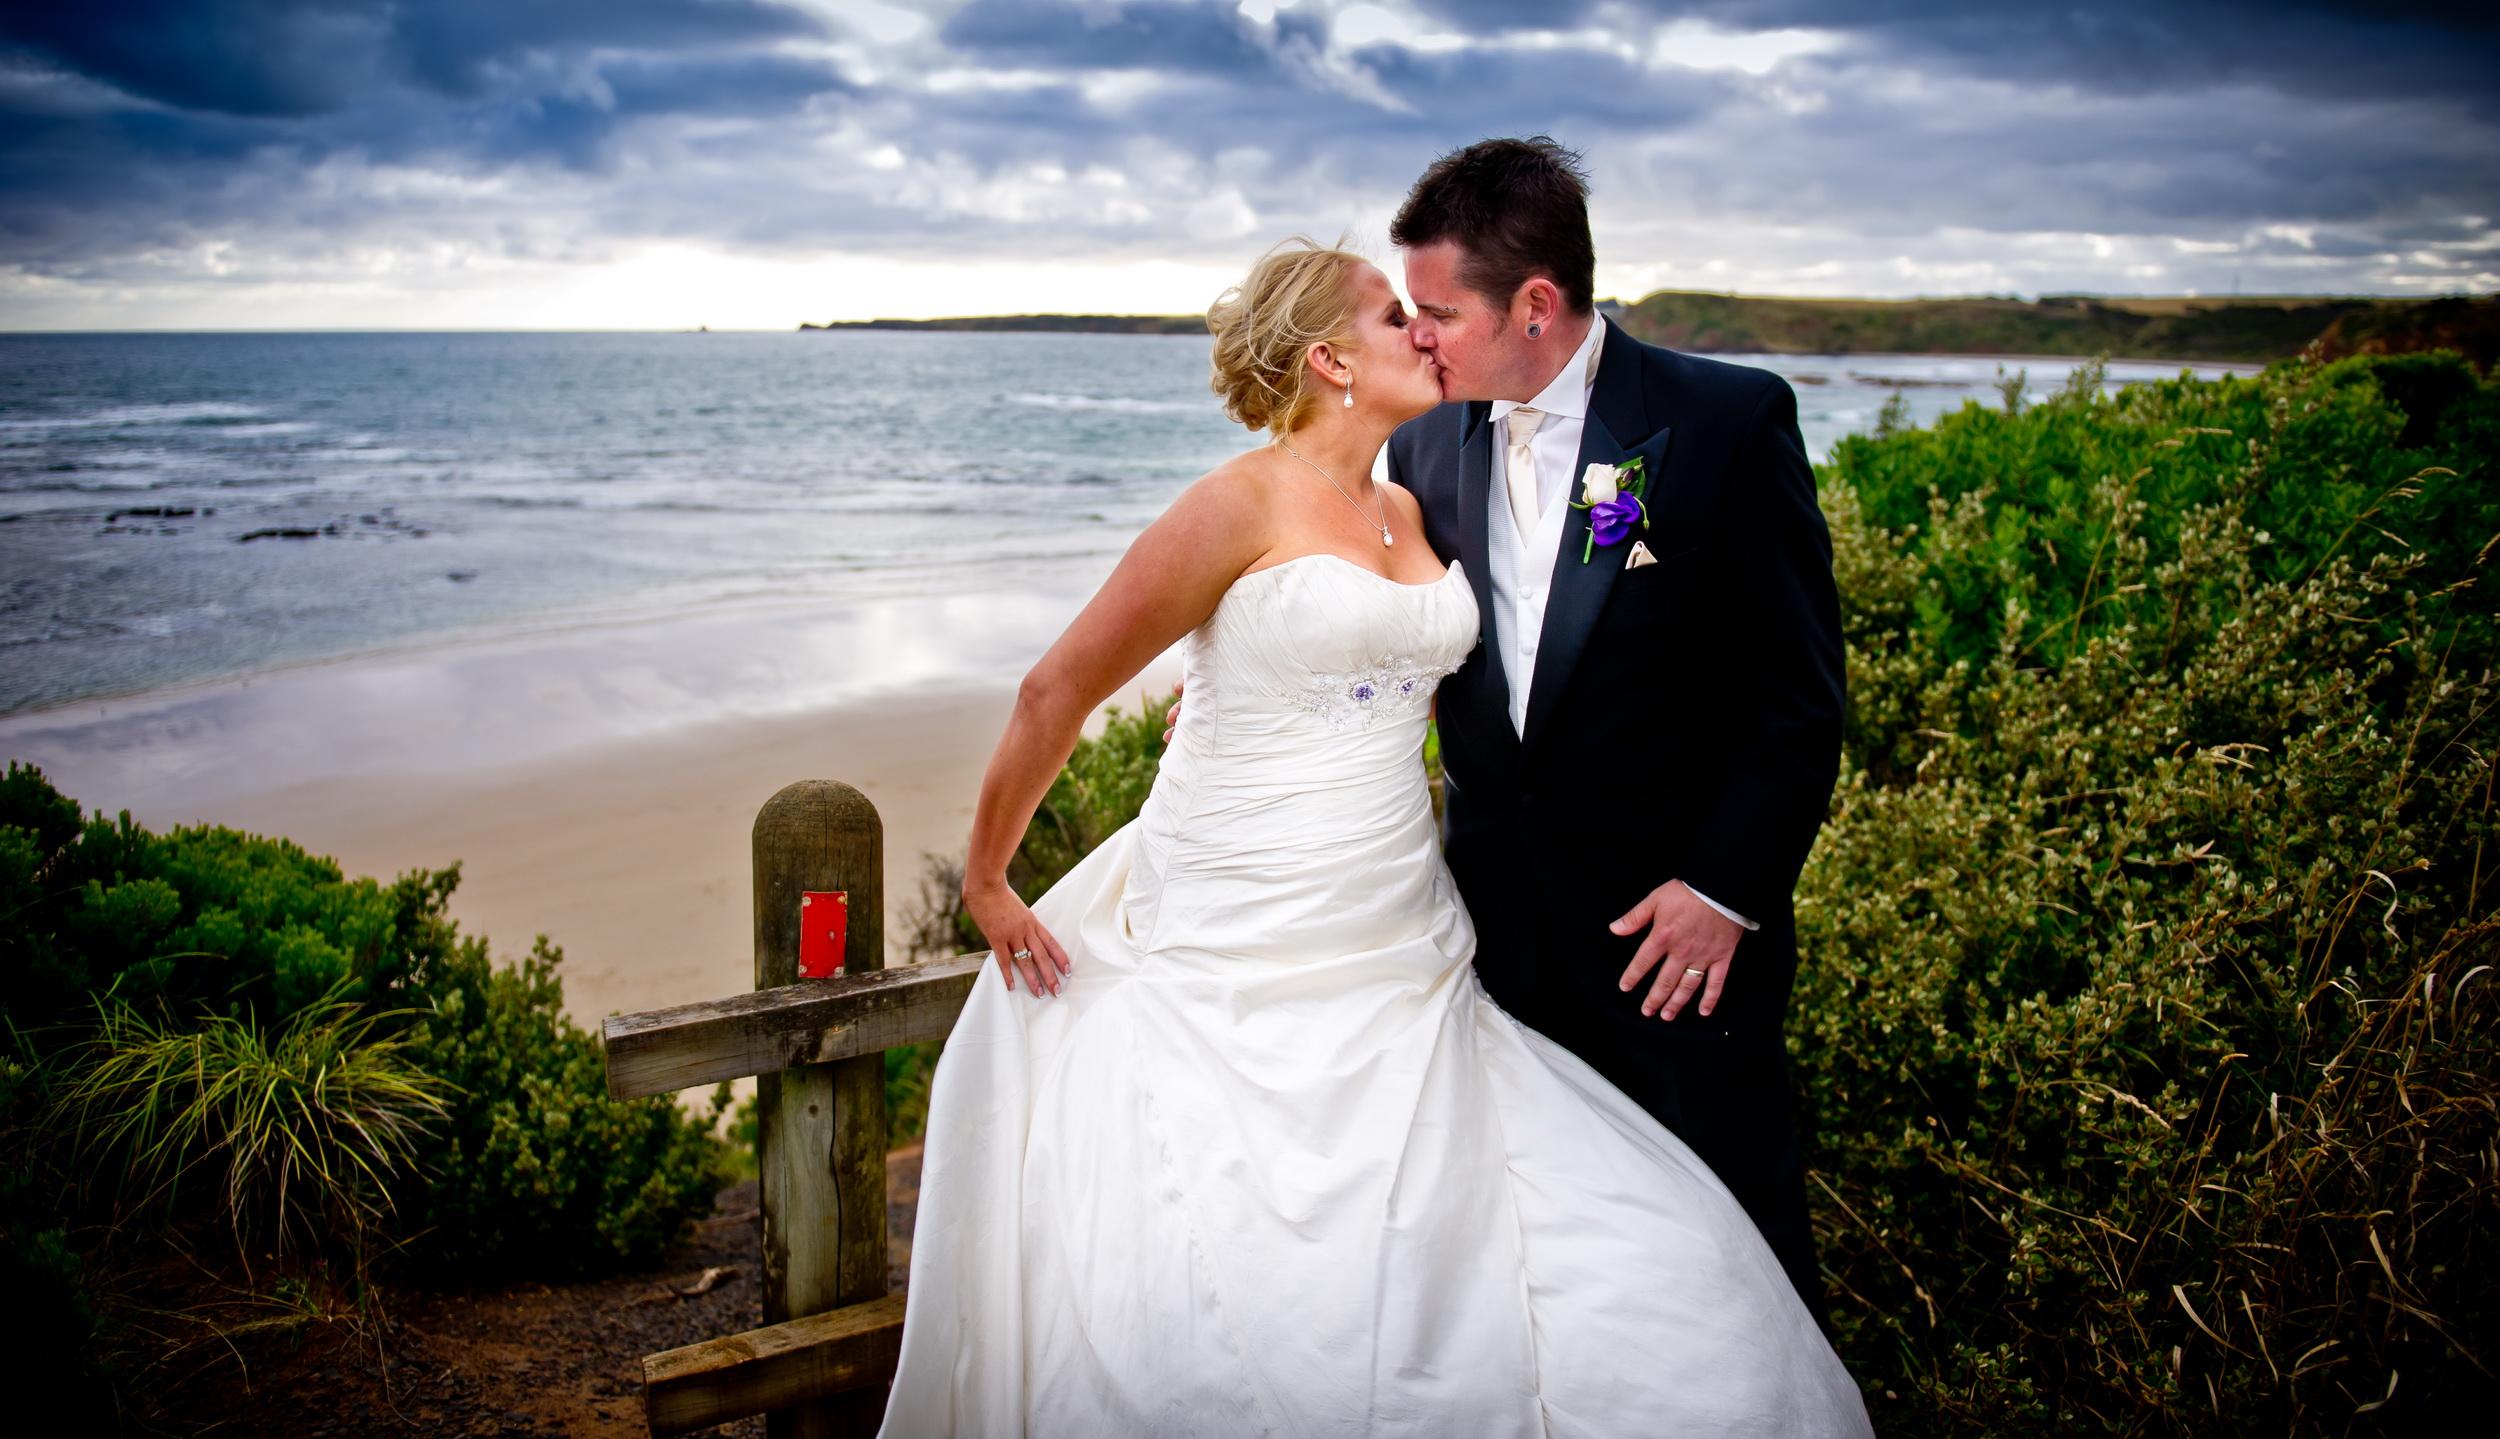 Bri & Glen - Phillip Island Wedding Photography